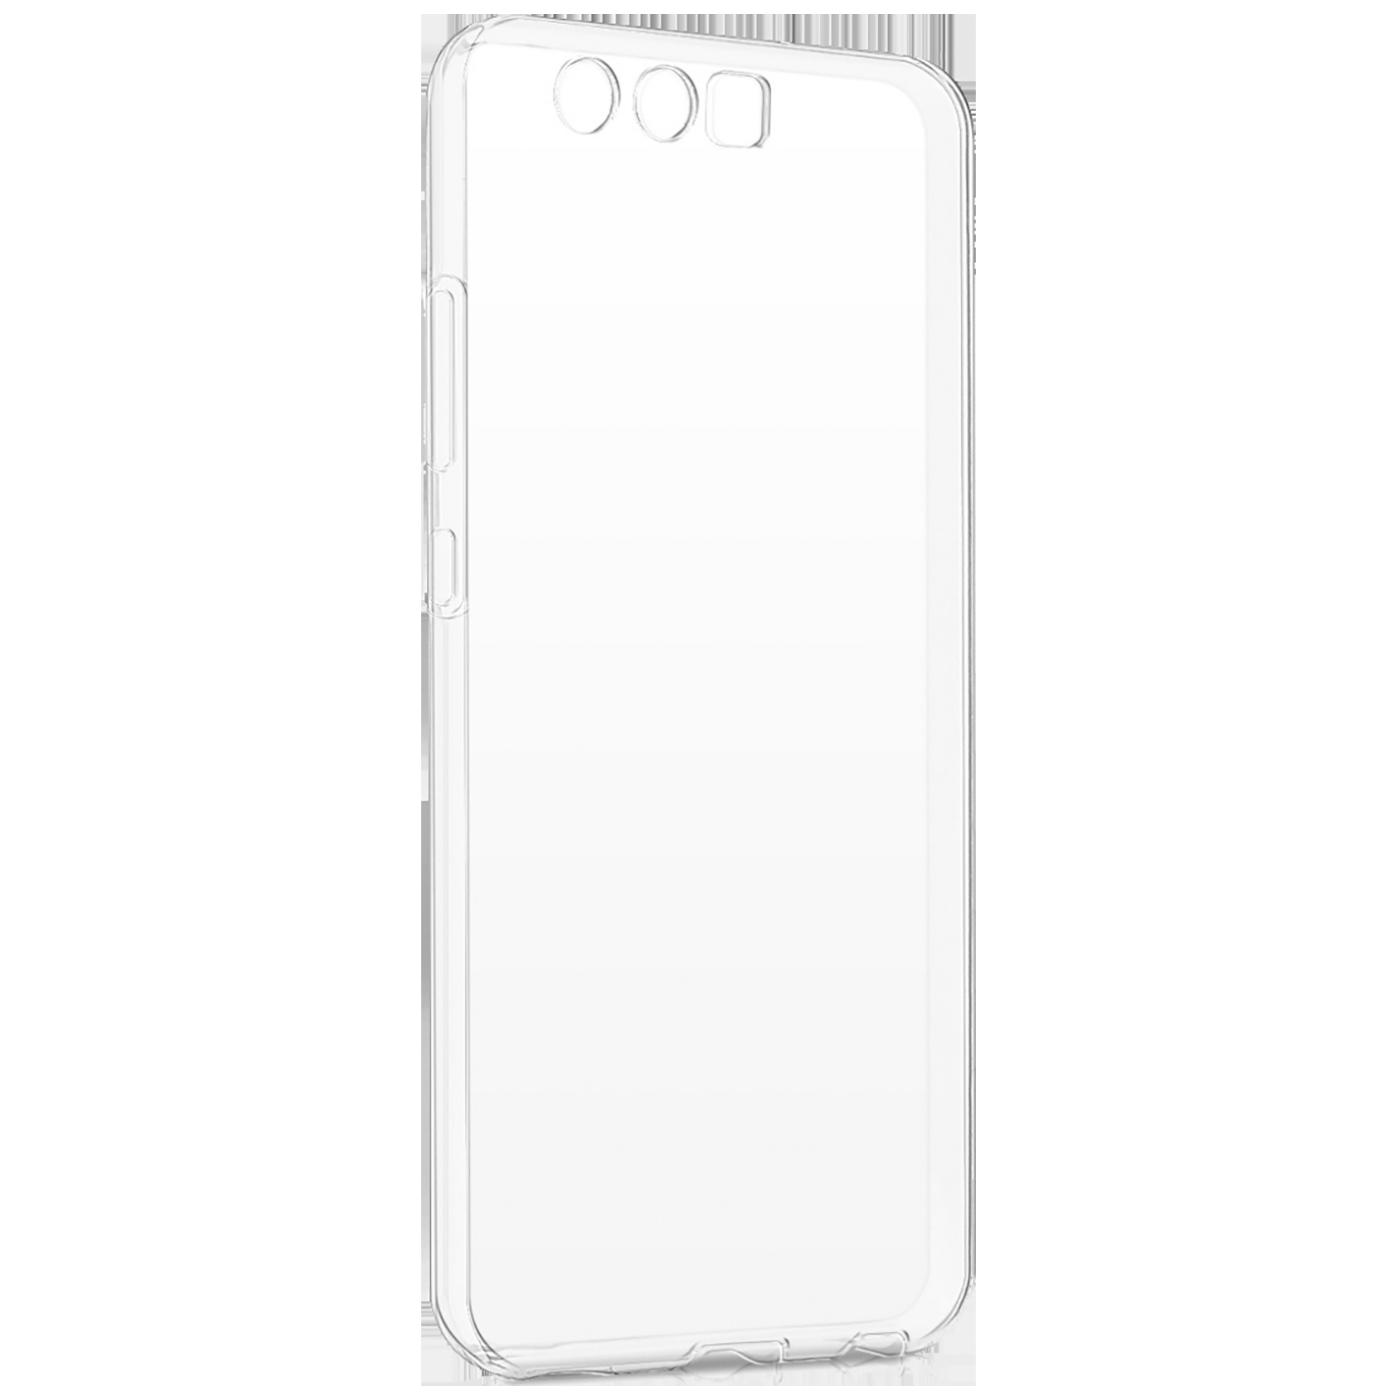 Futrola za mobitel Huawei P10, silikonska